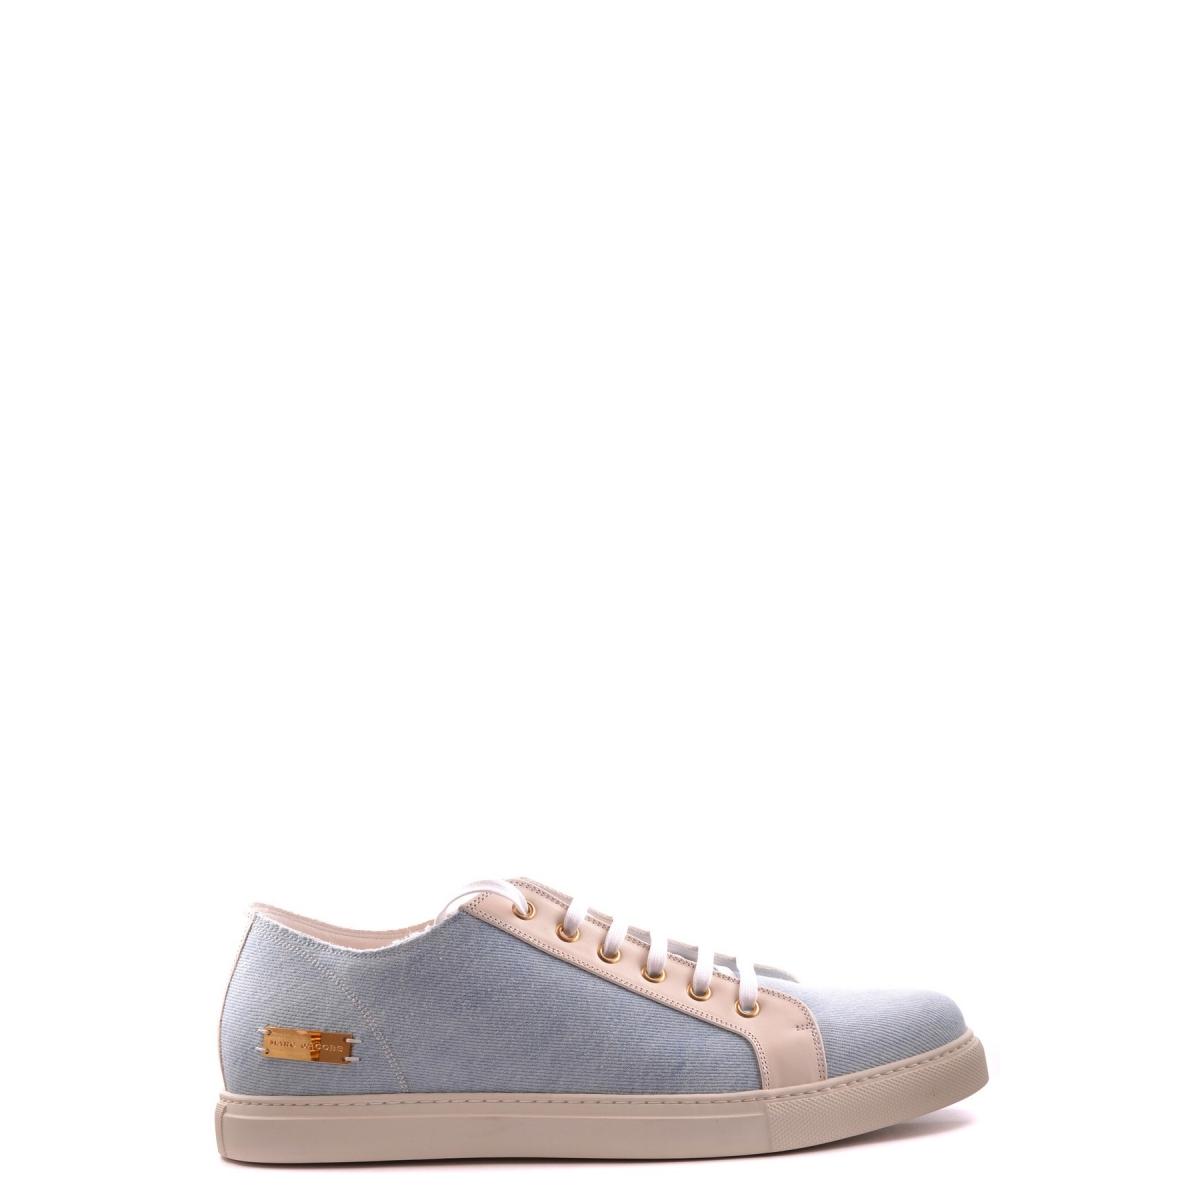 Sneakers basse -60% Marc Jacobs PR1344 19765IT -60% basse a80358